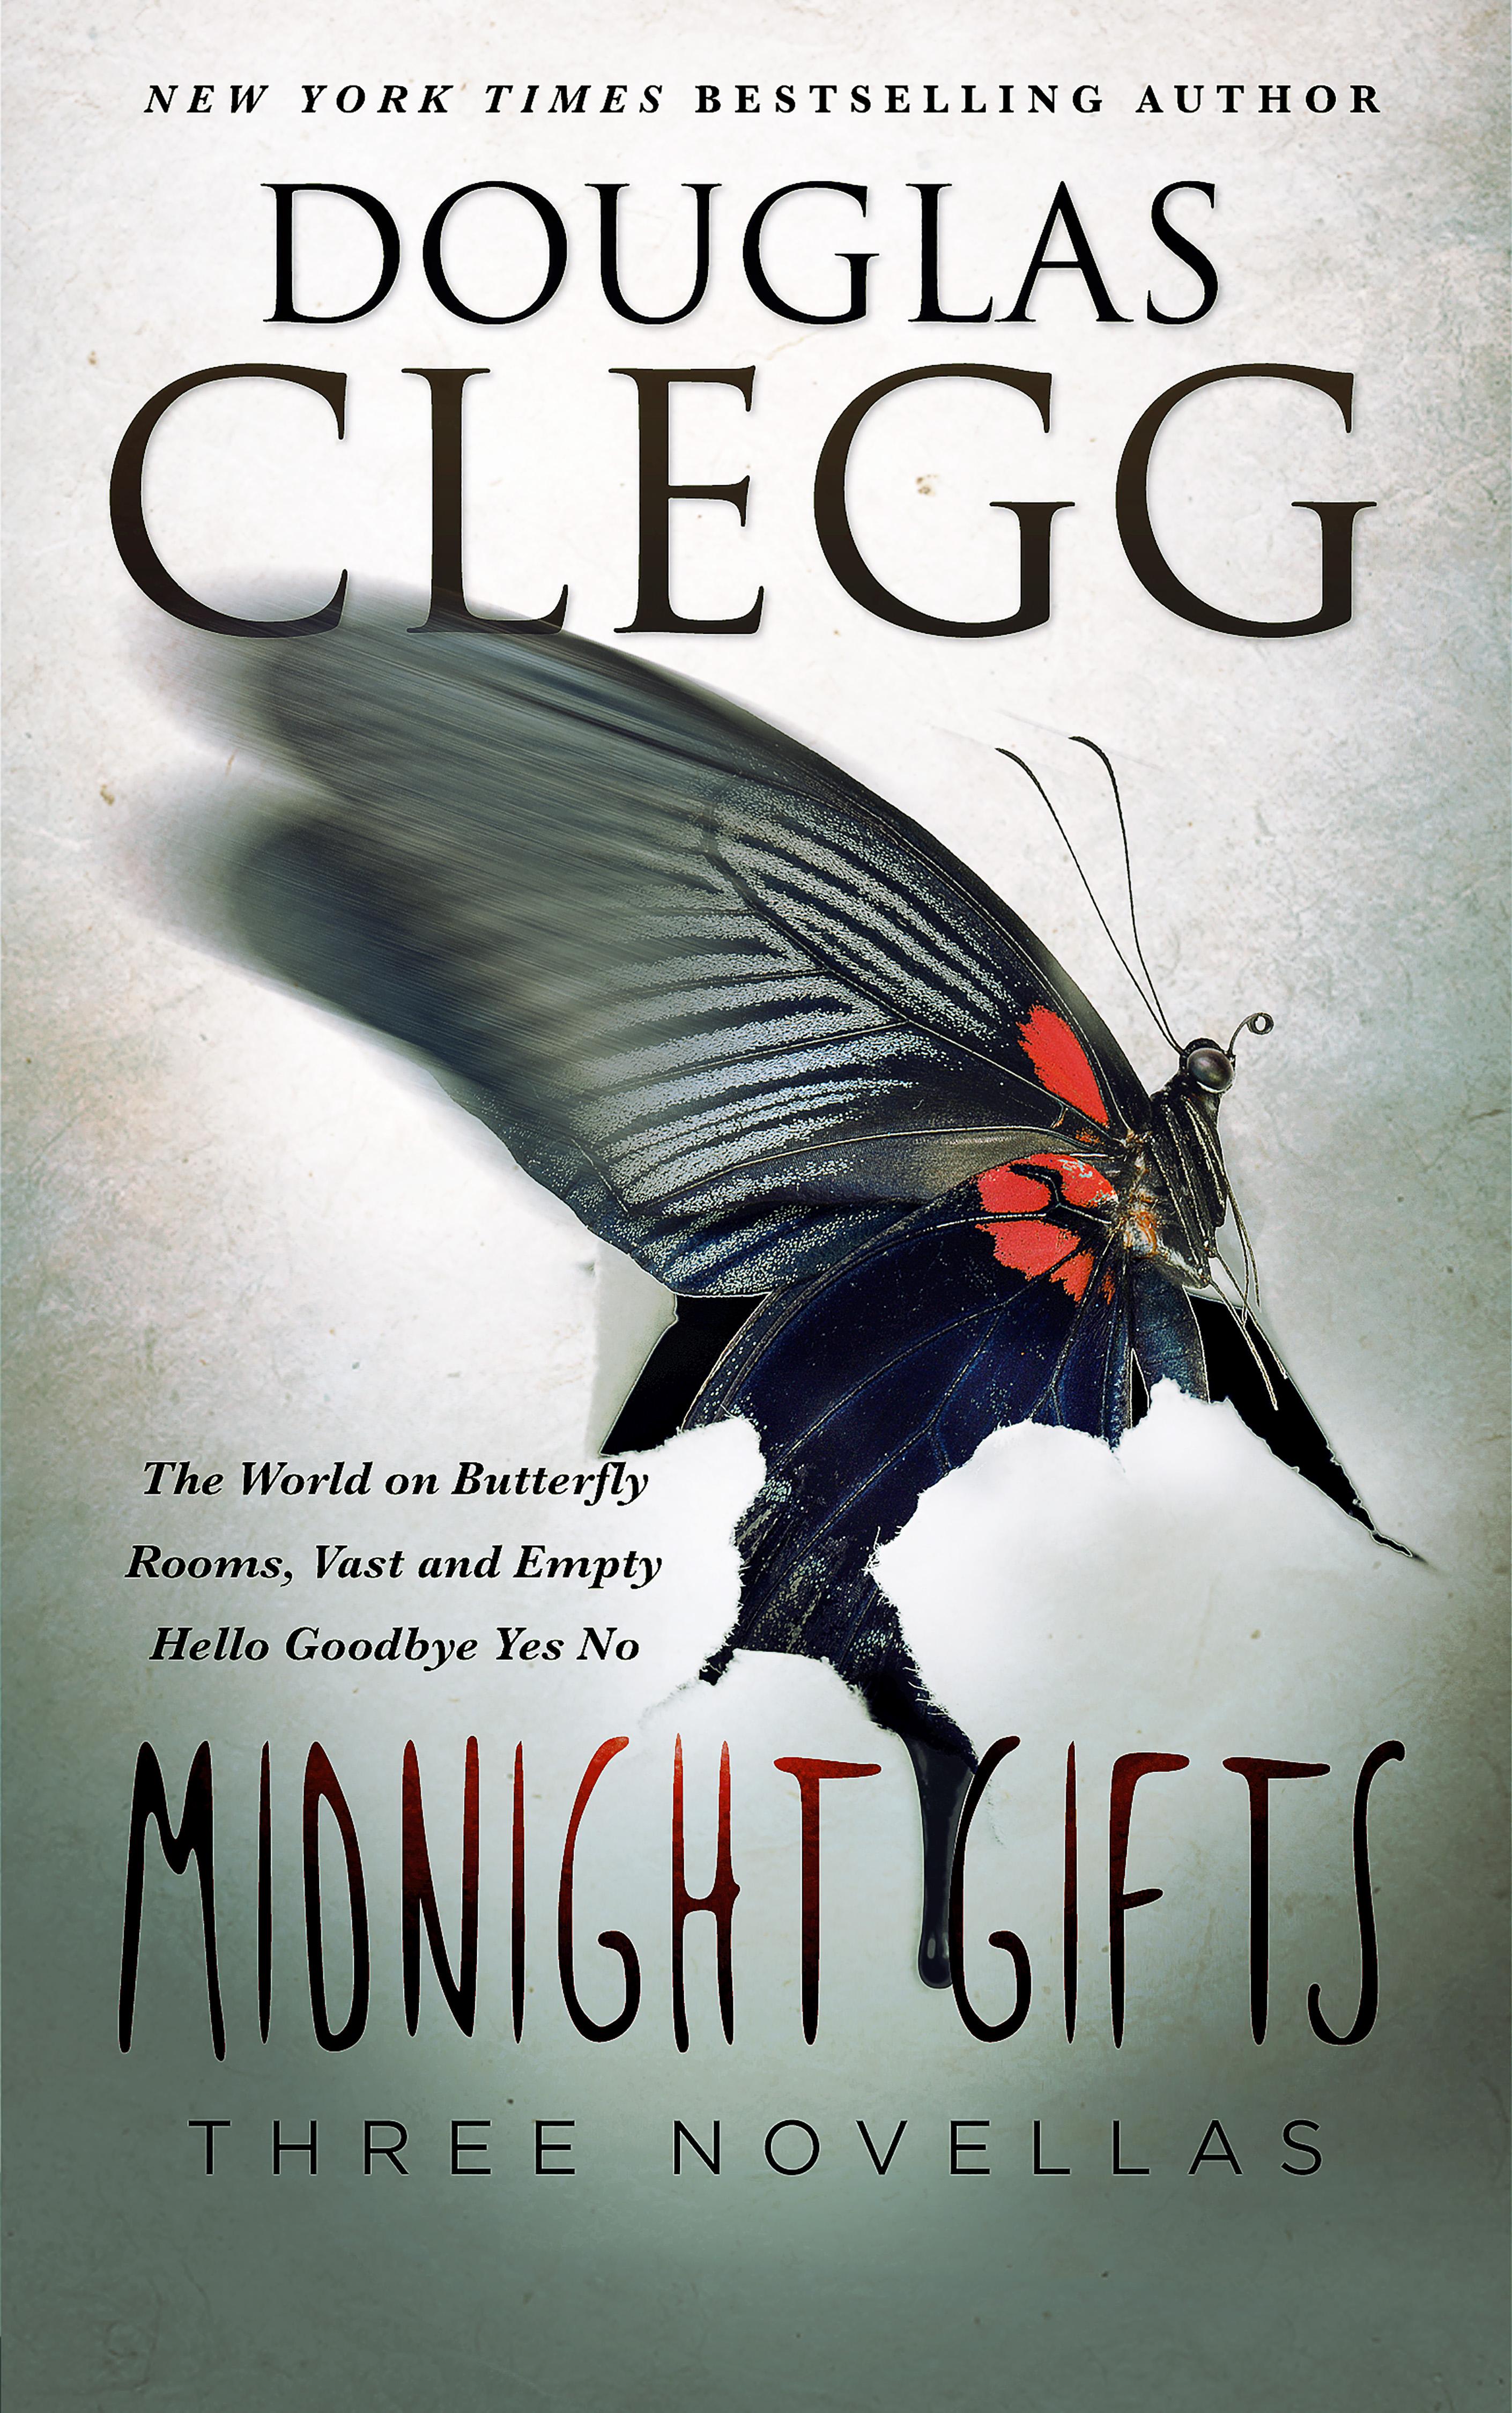 Midnight Gifts: Three Novellas